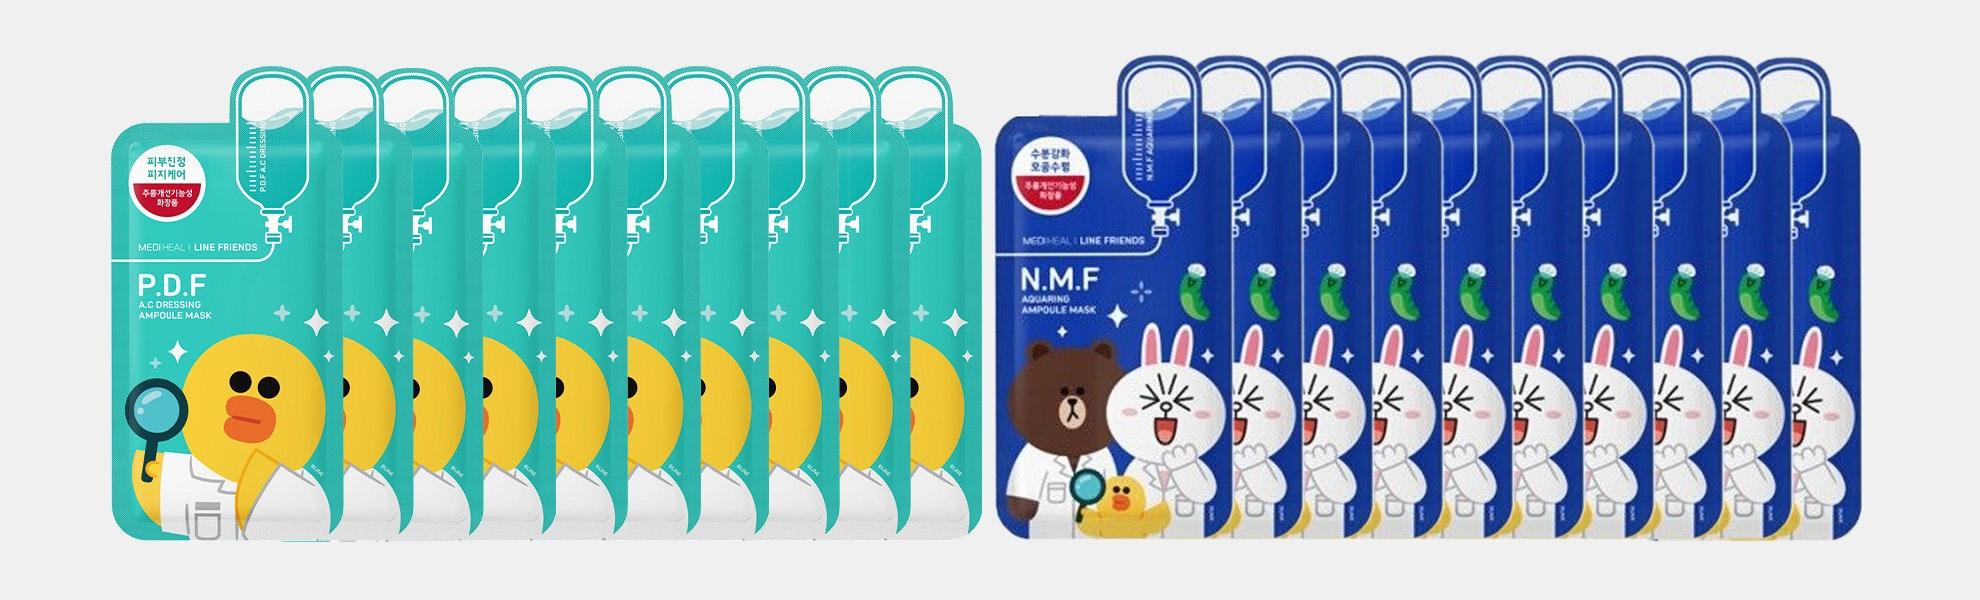 Mediheal Line Friends Ampoule Masks (20 Sheets)